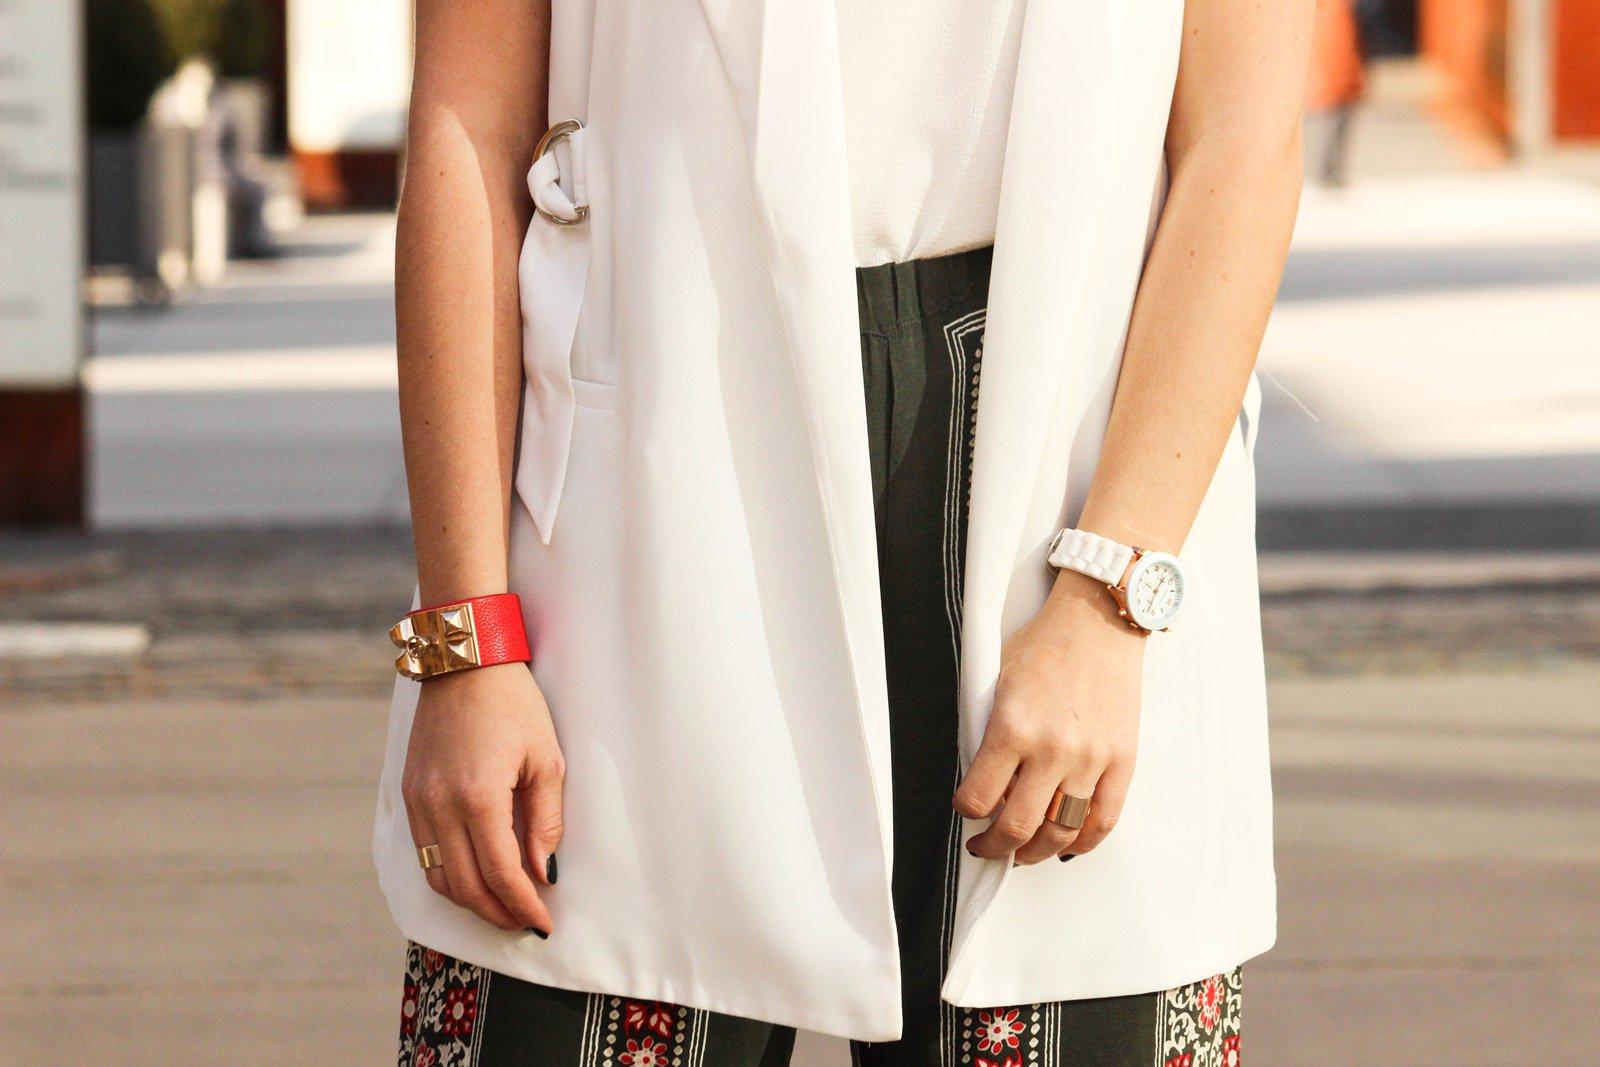 Des Belles Chosea_Fashionblog Cologne_Ethno palazzo trousers_Zara 8